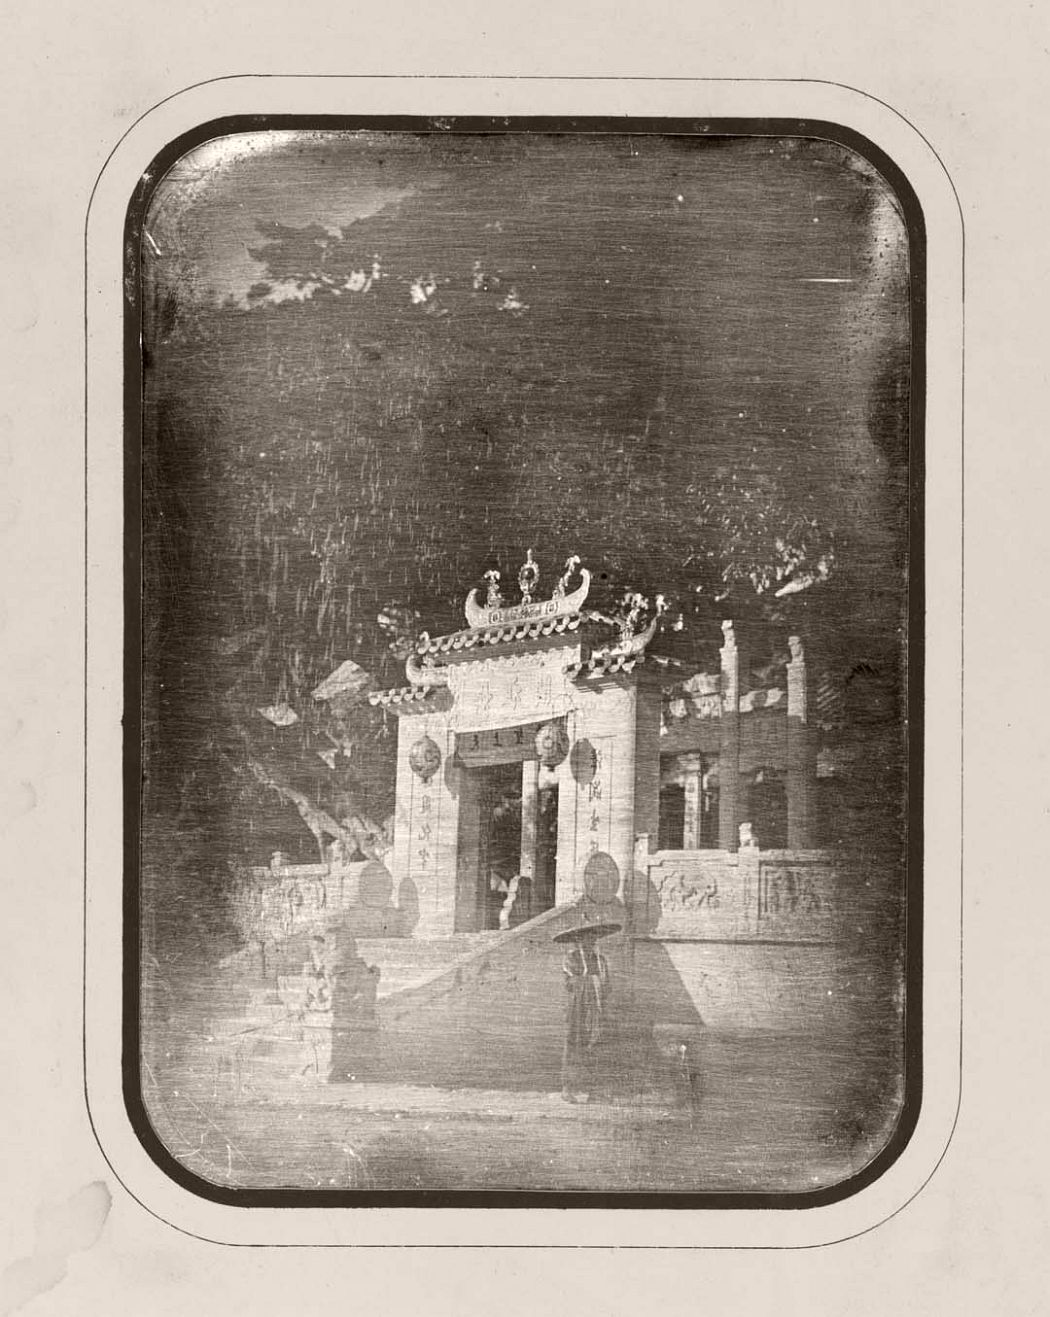 Porte de la grande pagode de la ville chinoise Macao, octobre 1844, daguerréotypie